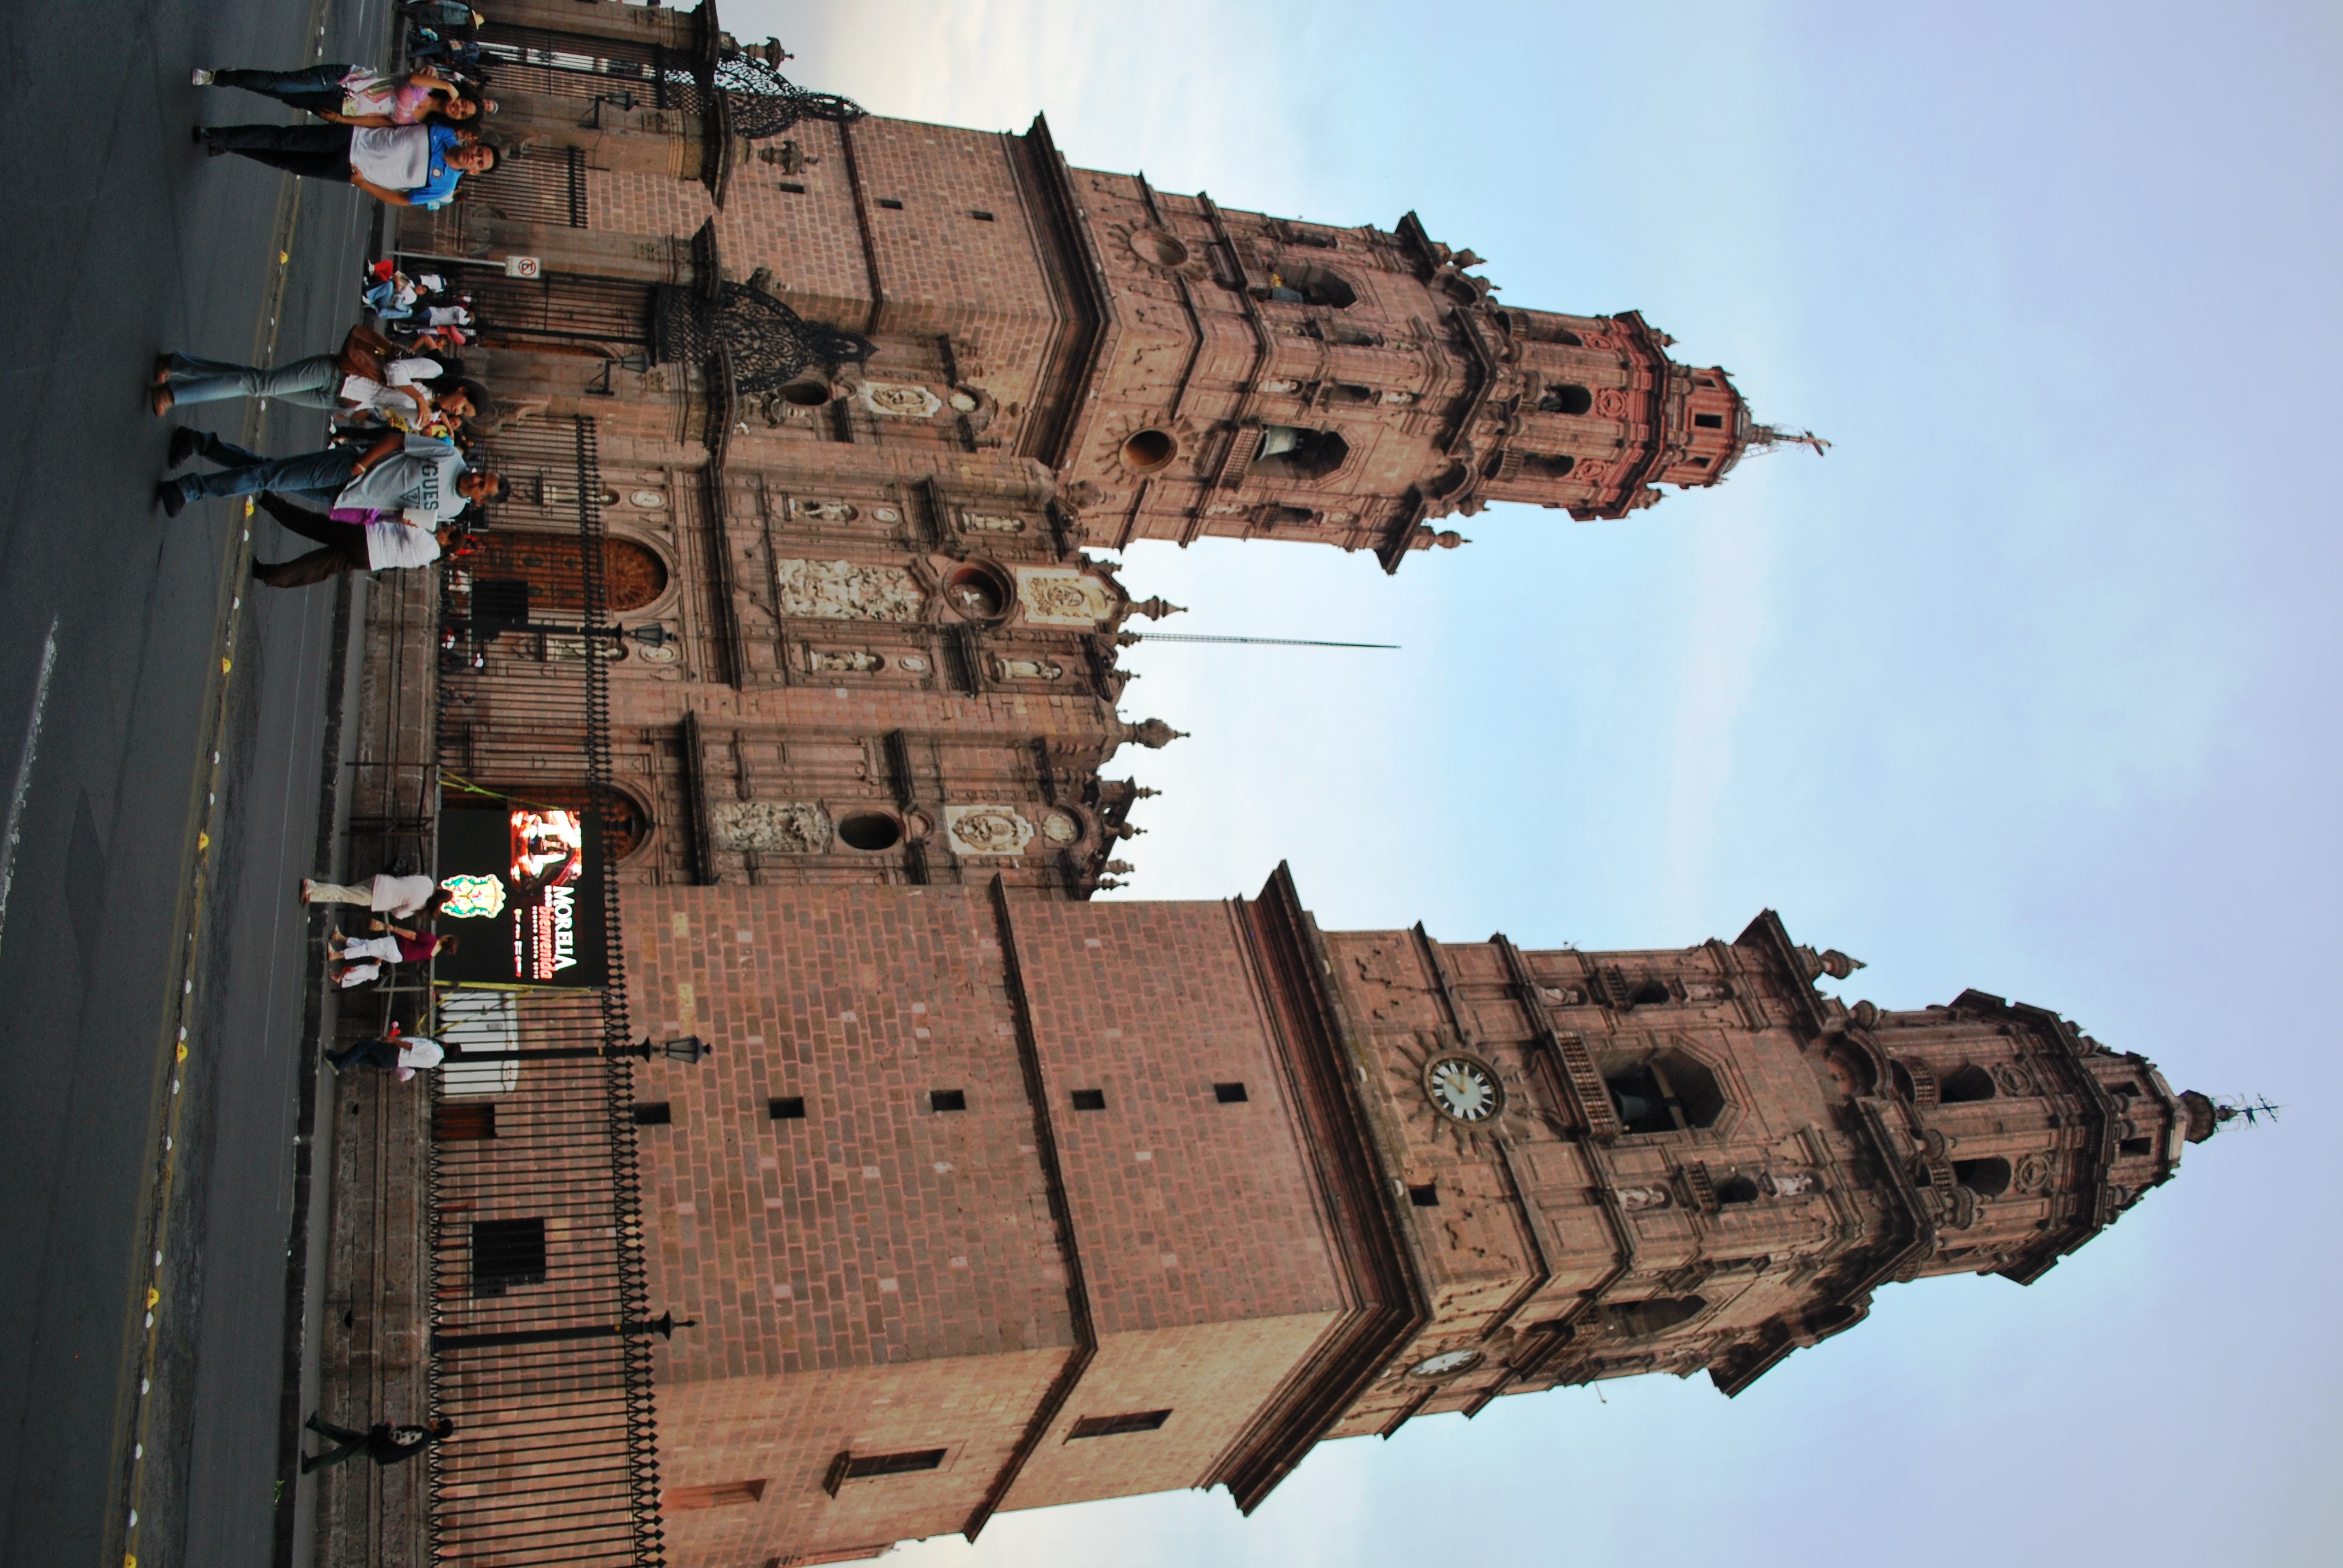 Depiction of Catedral de Morelia